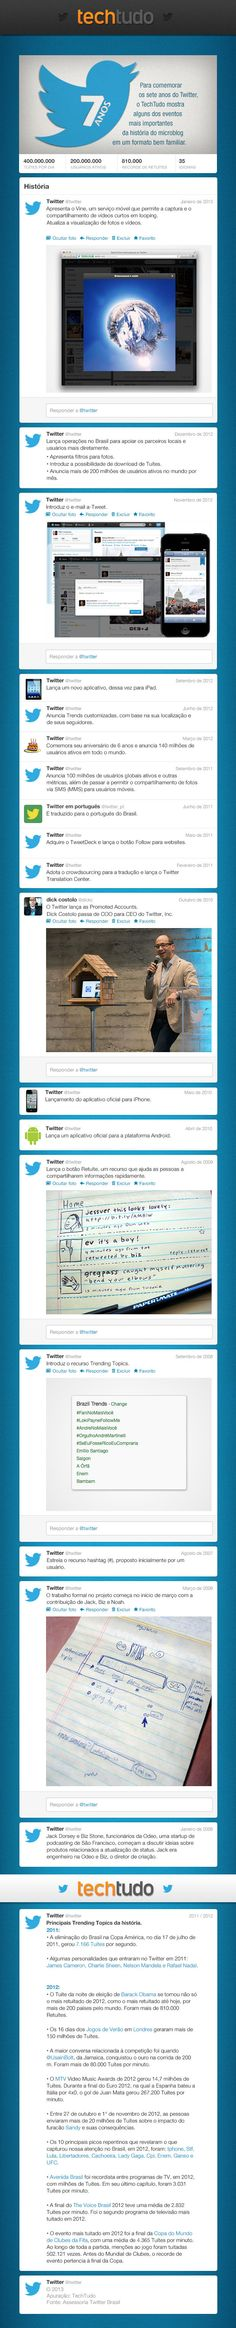 twitter-7anos-techtudo